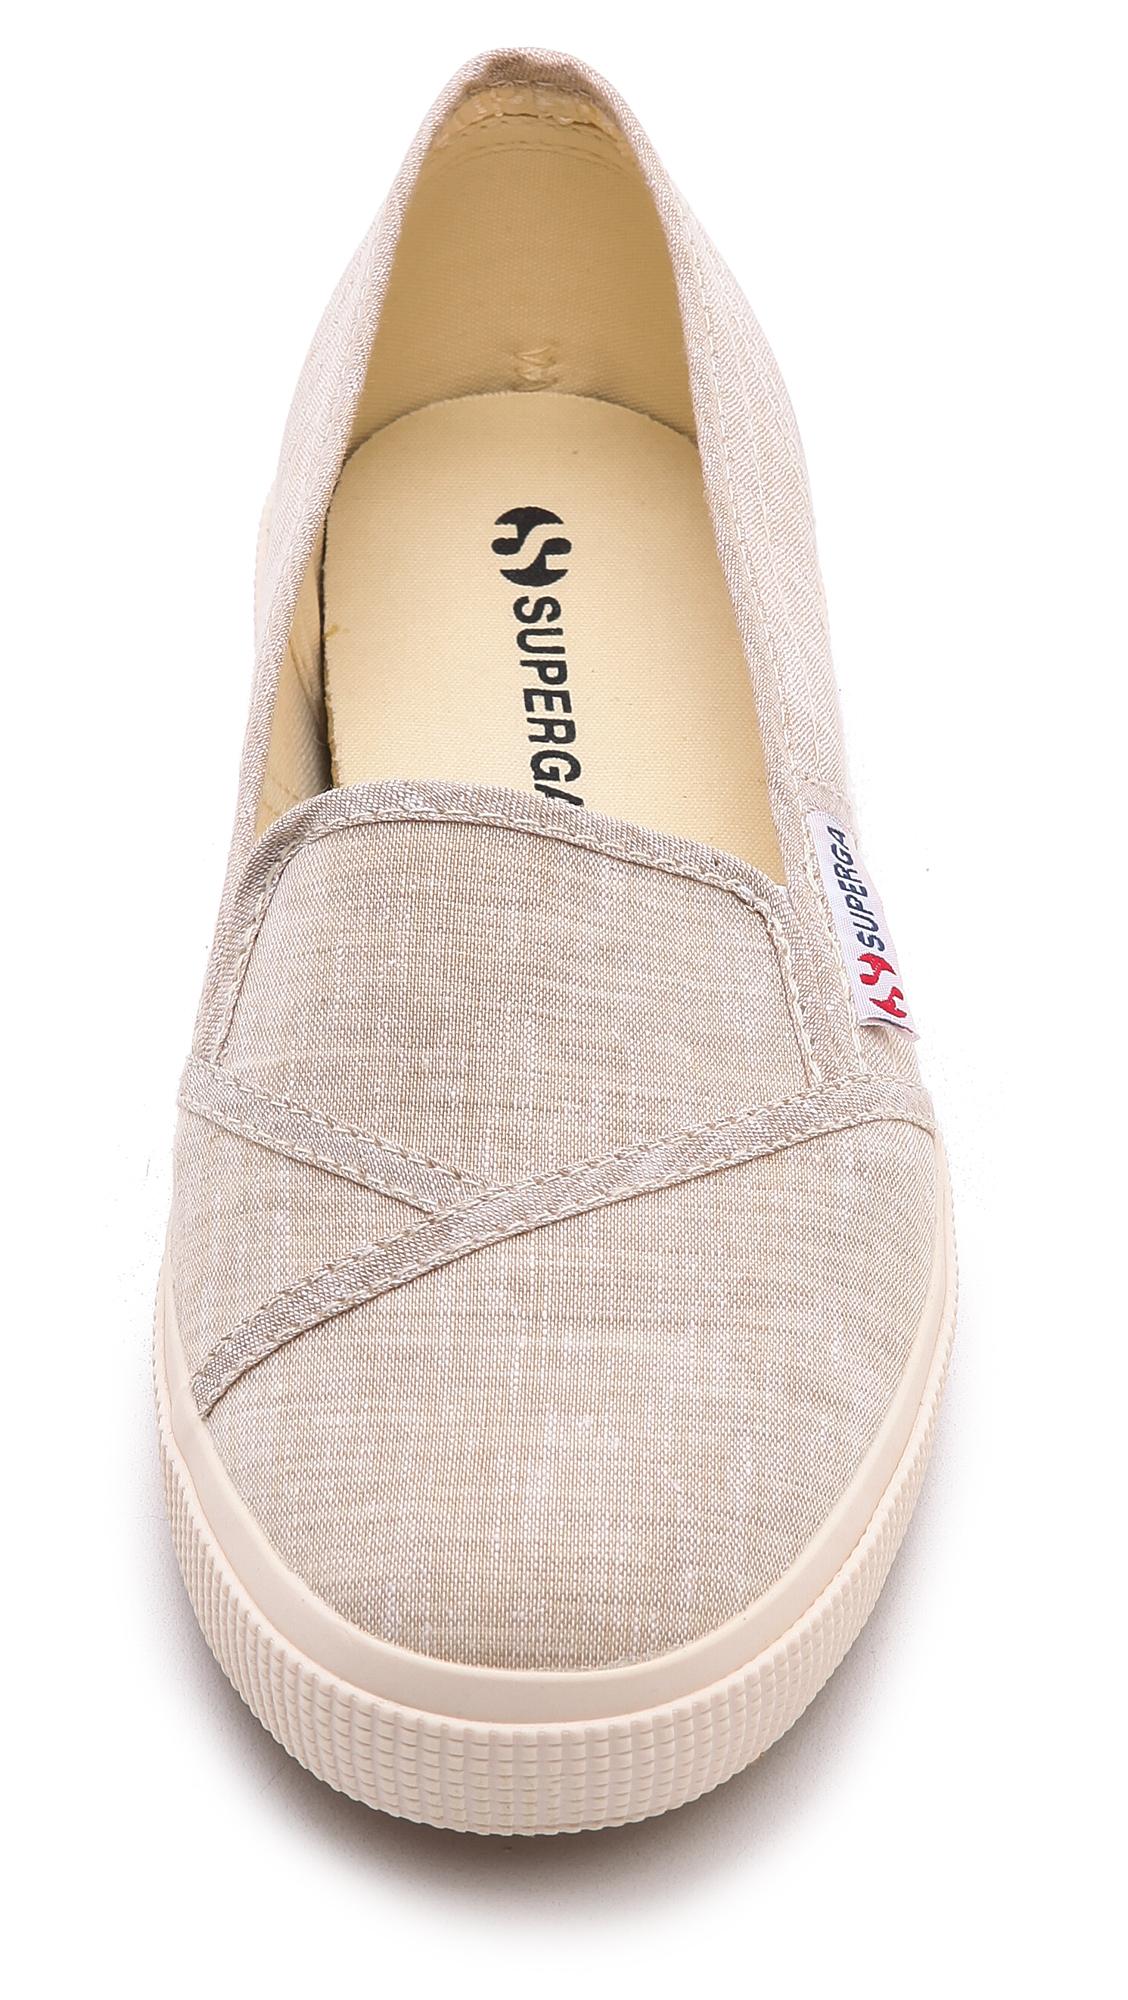 Superga: Superga Cotu Slip On Sneakers Sand In Natural